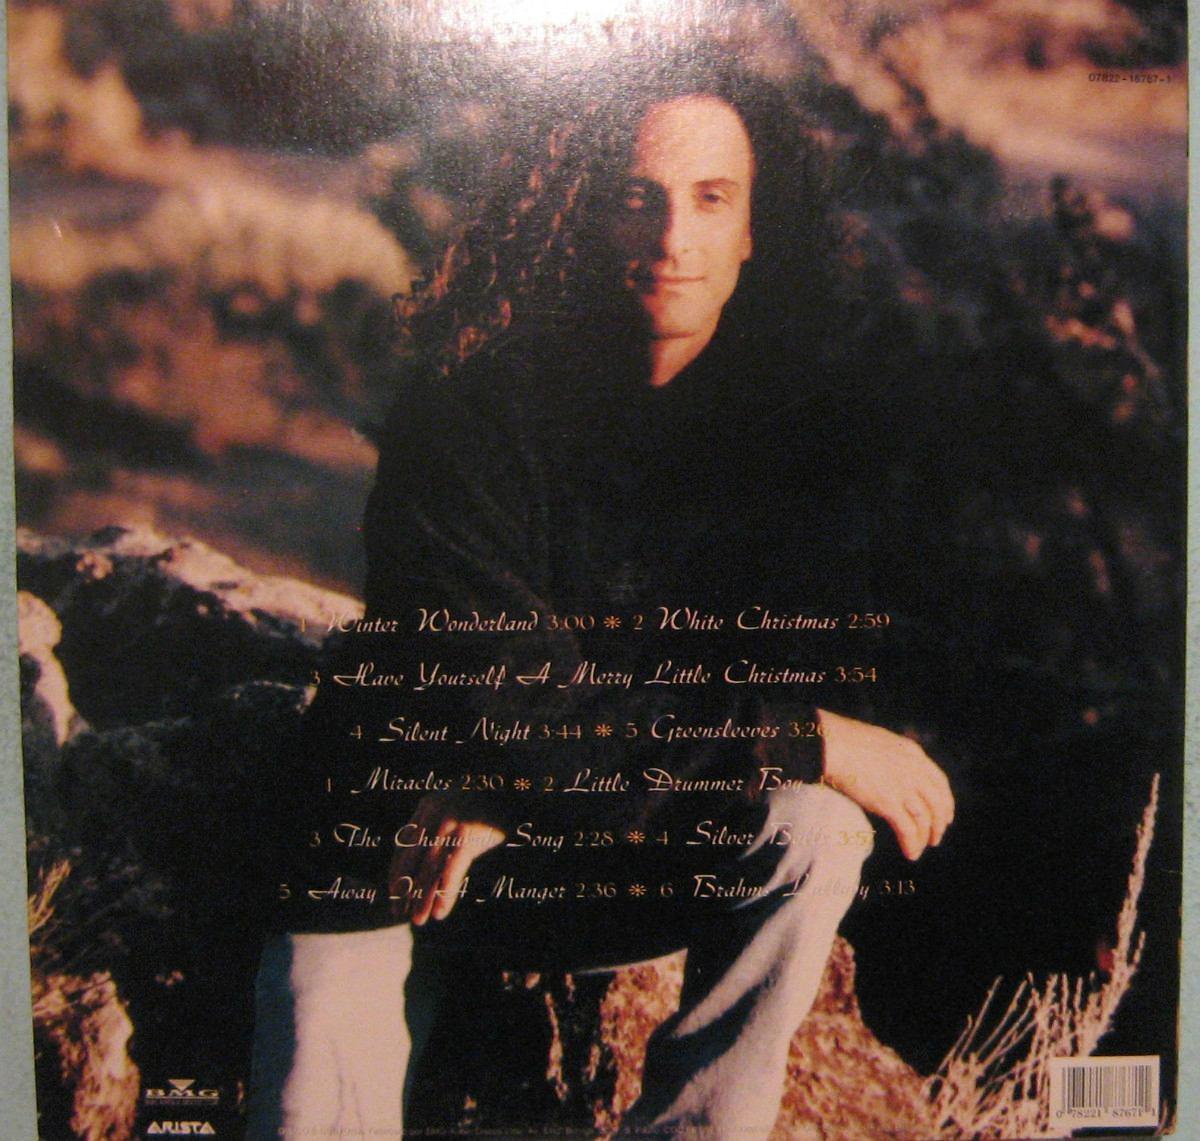 Kenny G - Miracles The Holiday Album - 1994 - R$ 145,00 em Mercado Livre